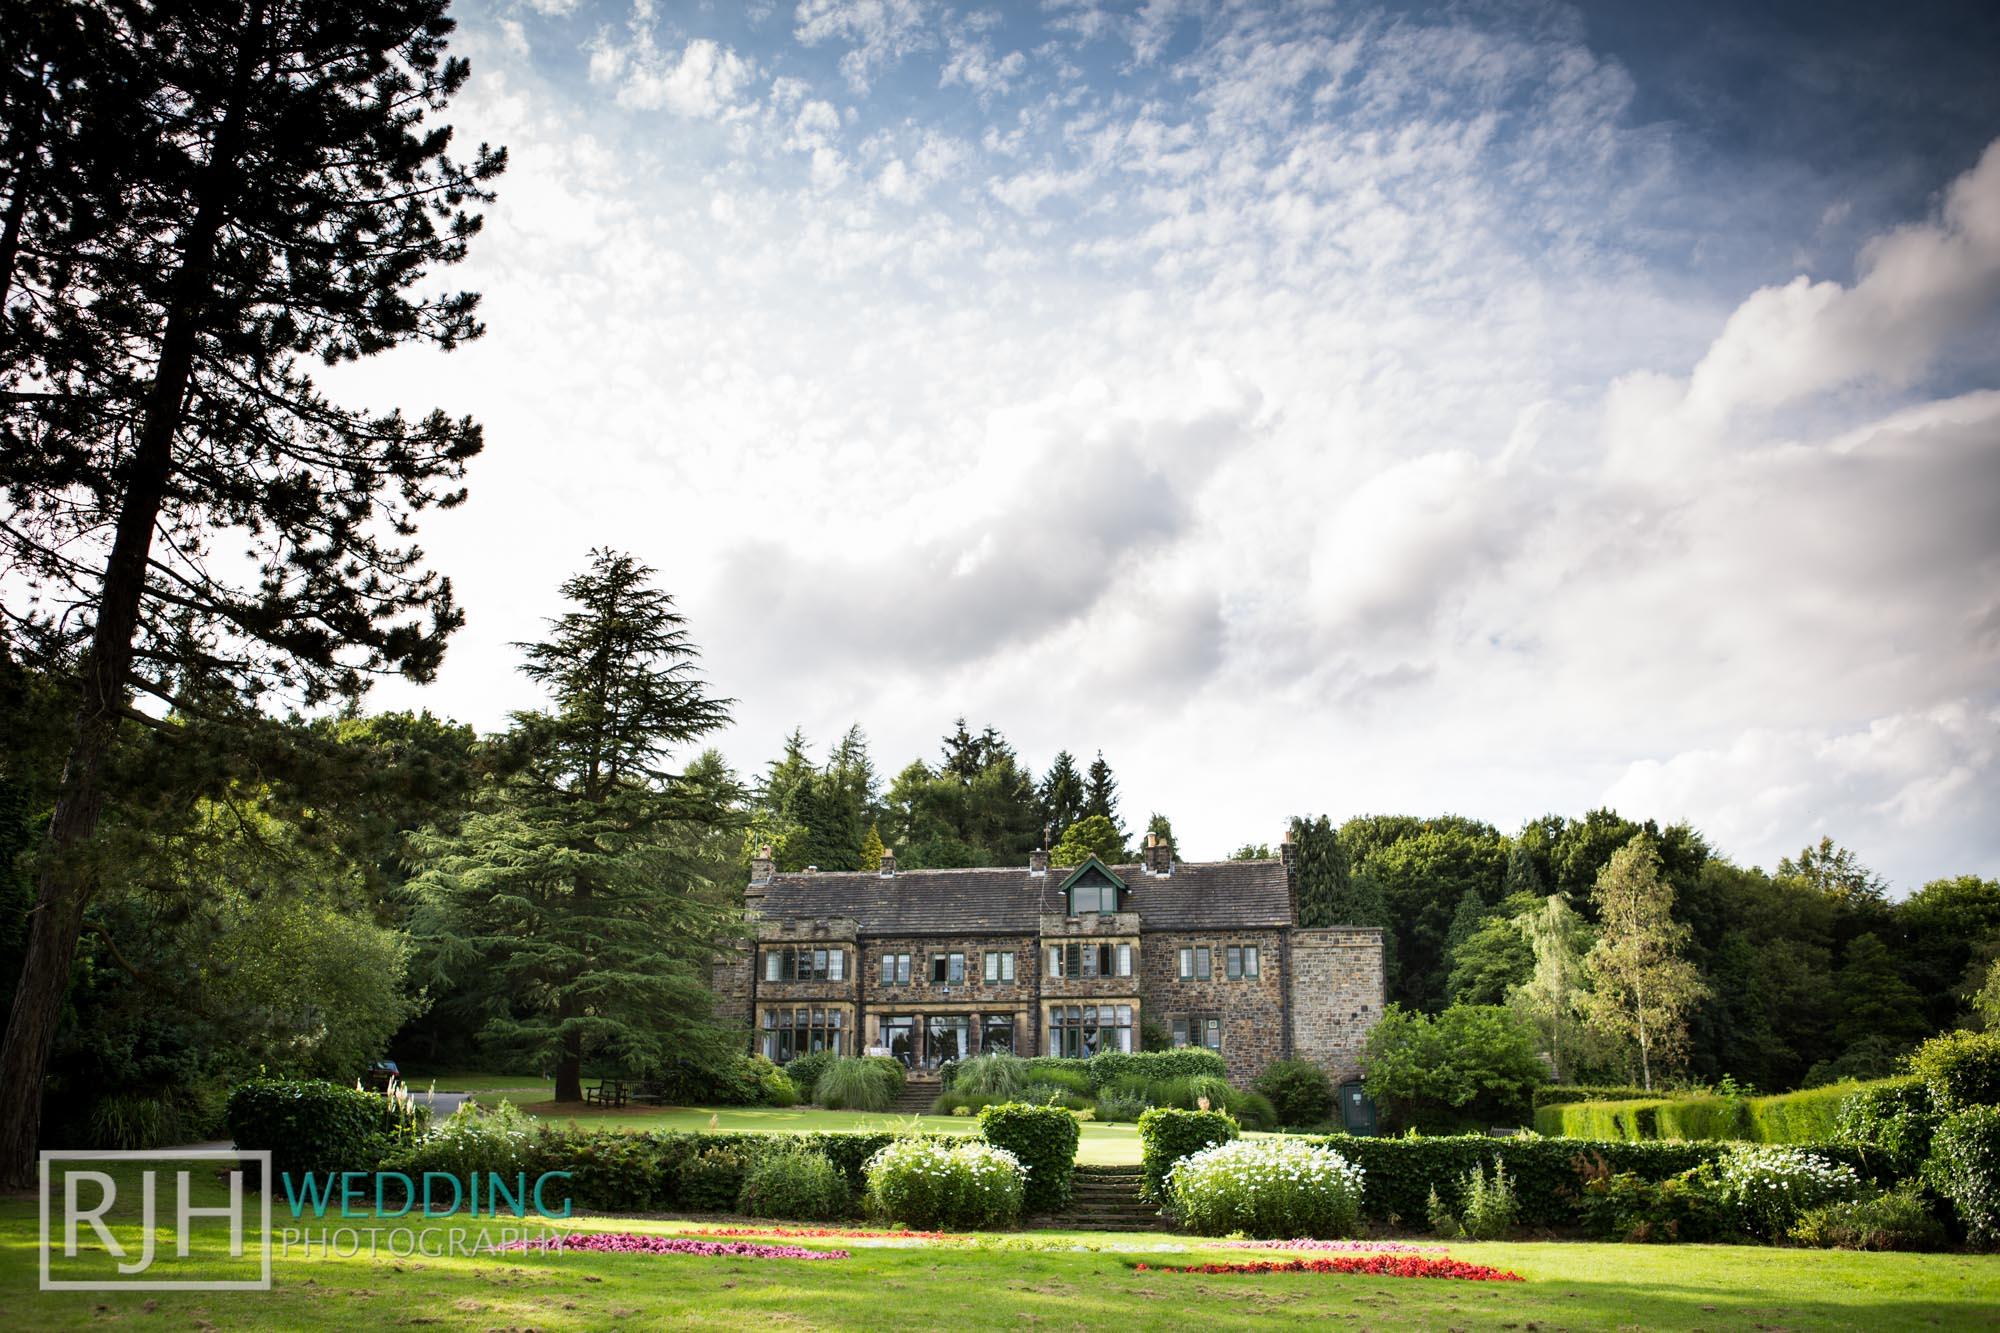 Whirlowbrook Hall Wedding Photography.jpg